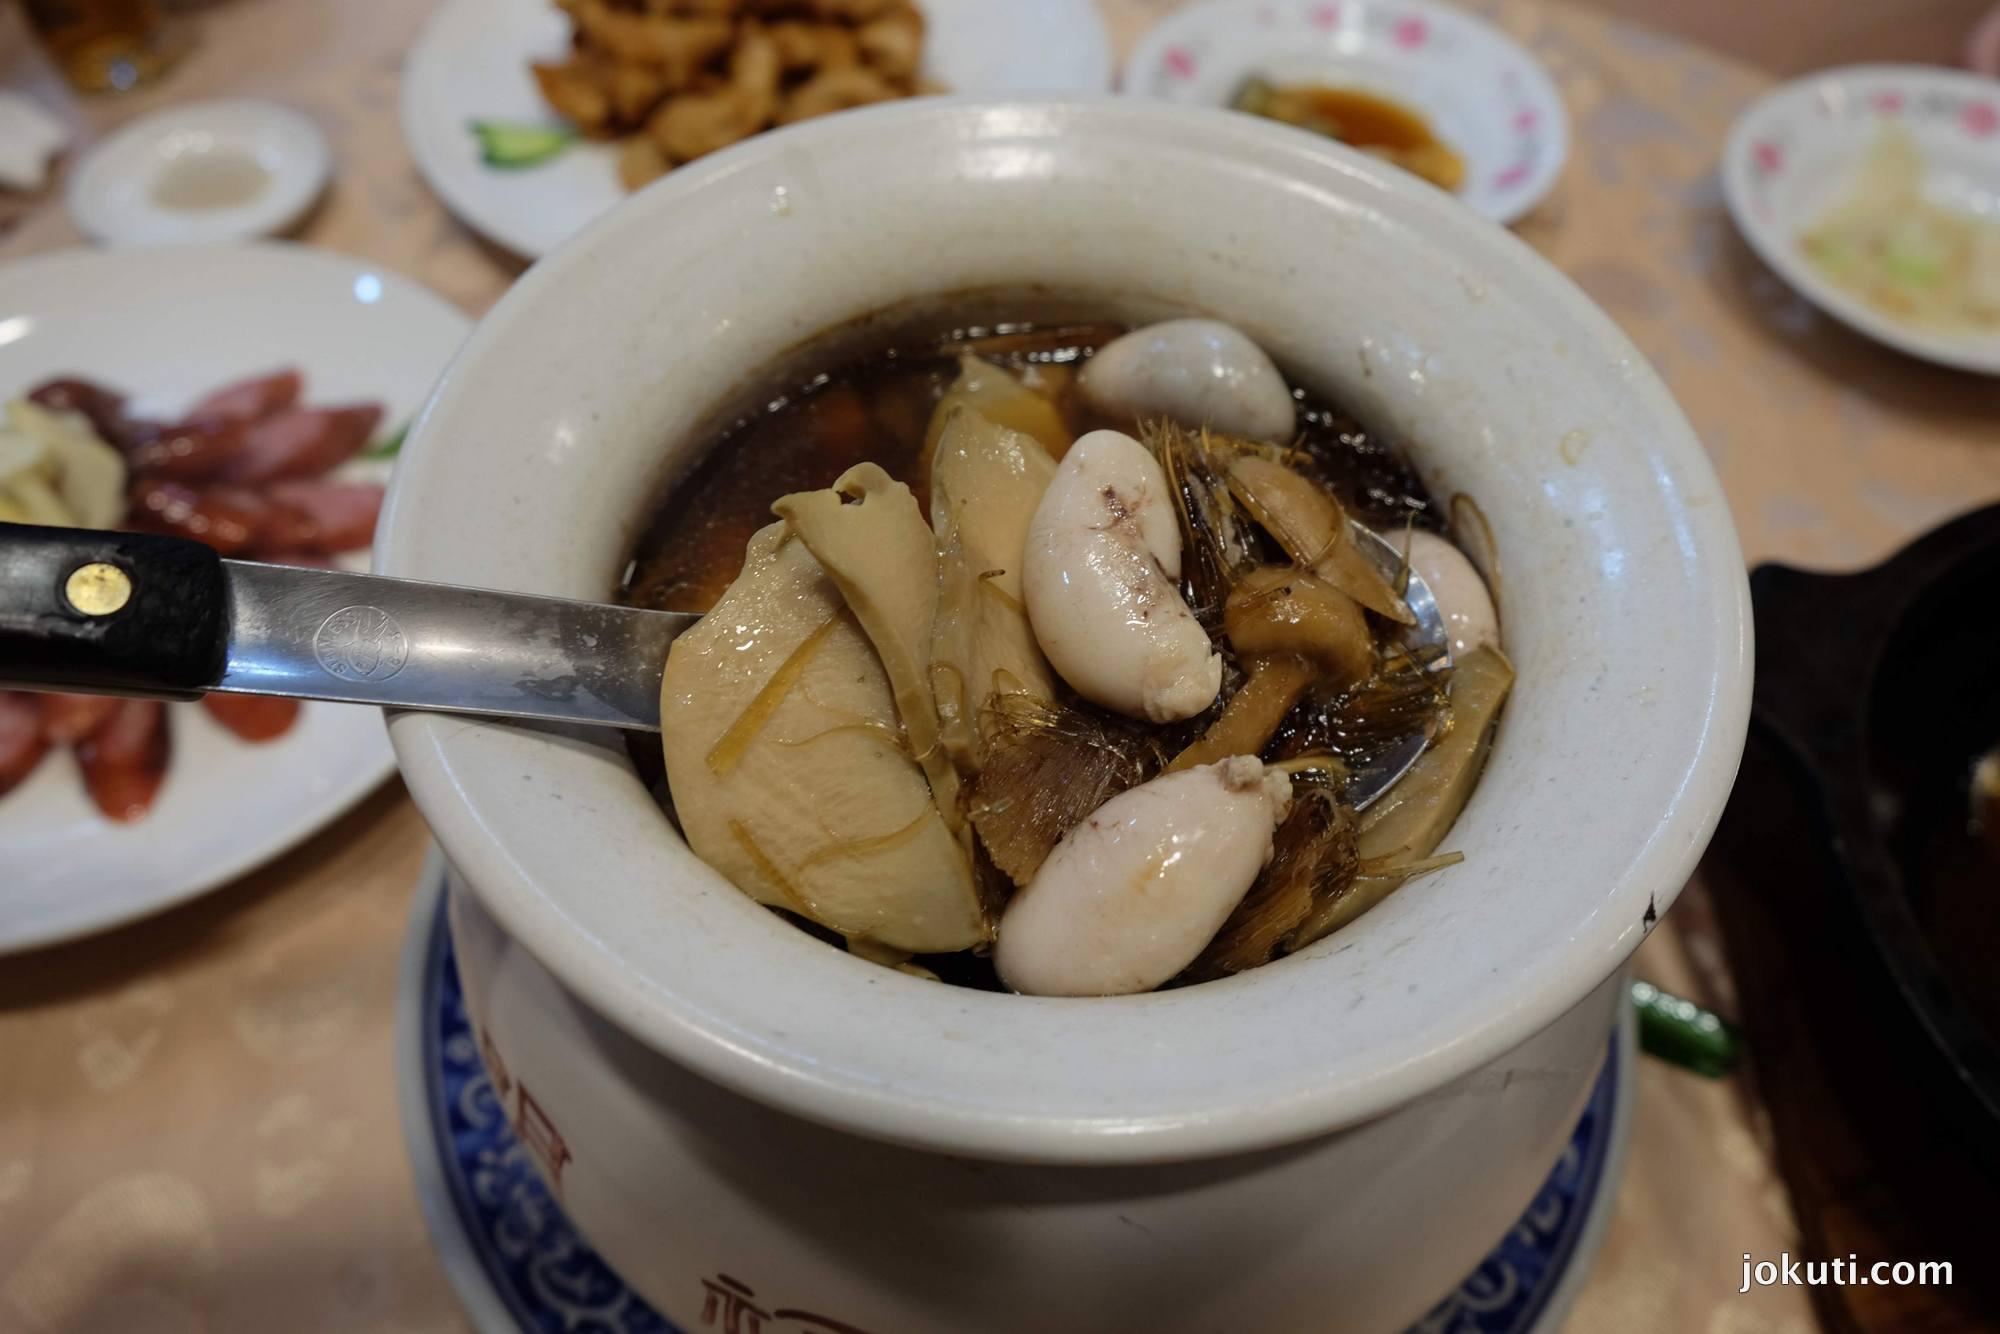 dscf2964_taipei_ming_fu_seafood_michelin_taiwan_vilagevo_jokuti.jpg